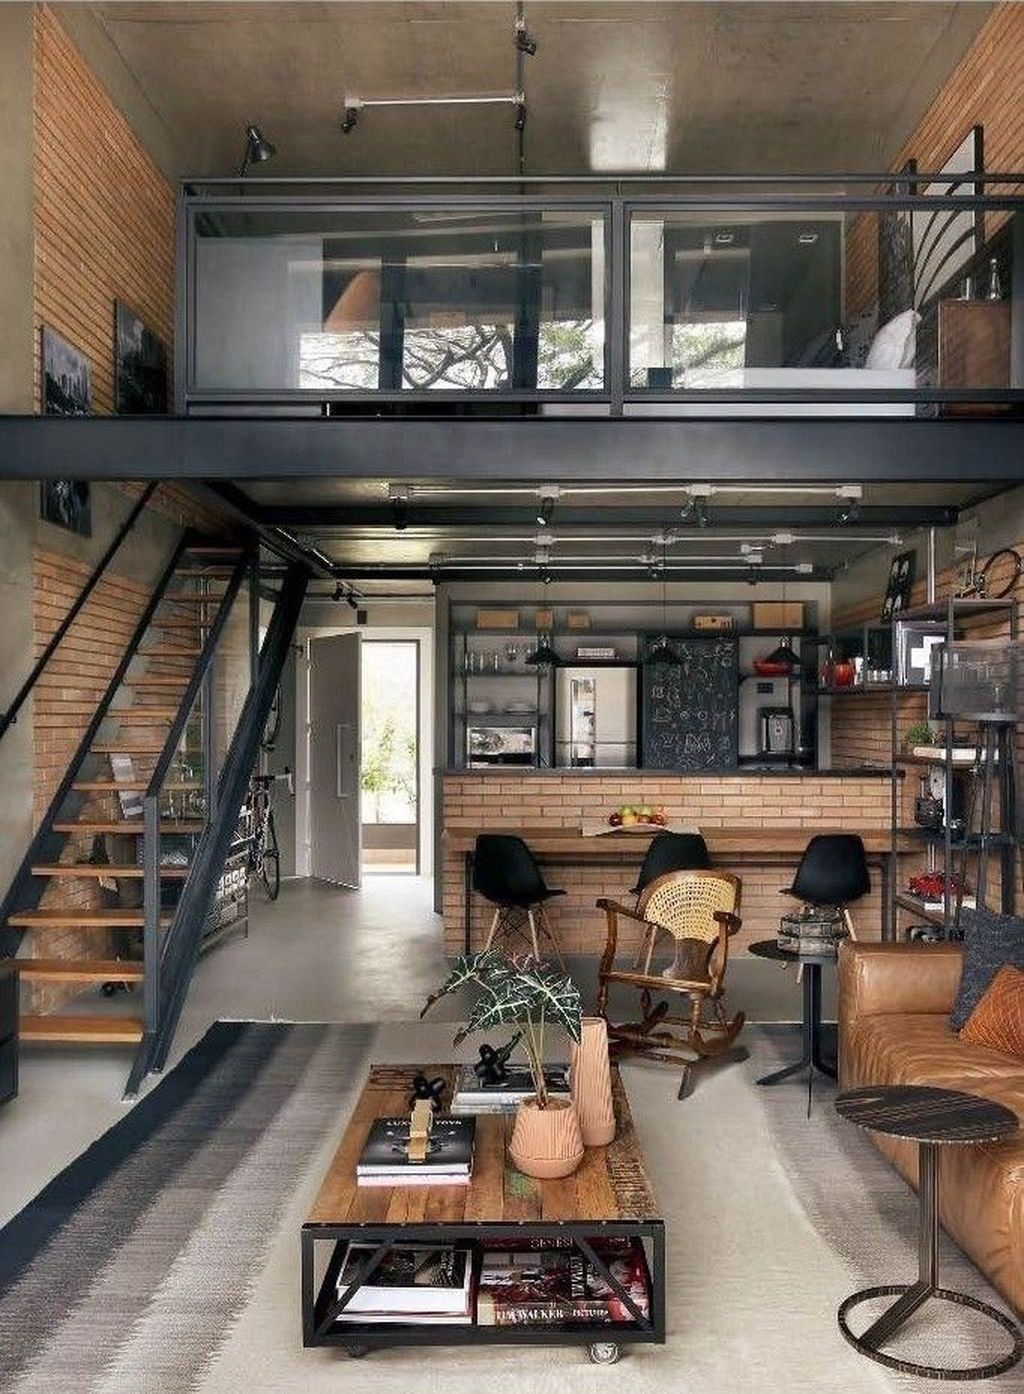 20 Astonishing Tiny House Design Ideas That Inspired To The Moon 20 Astonishing Tiny In 2020 Loft Apartment Decorating Tiny House Interior Design Tiny House Interior